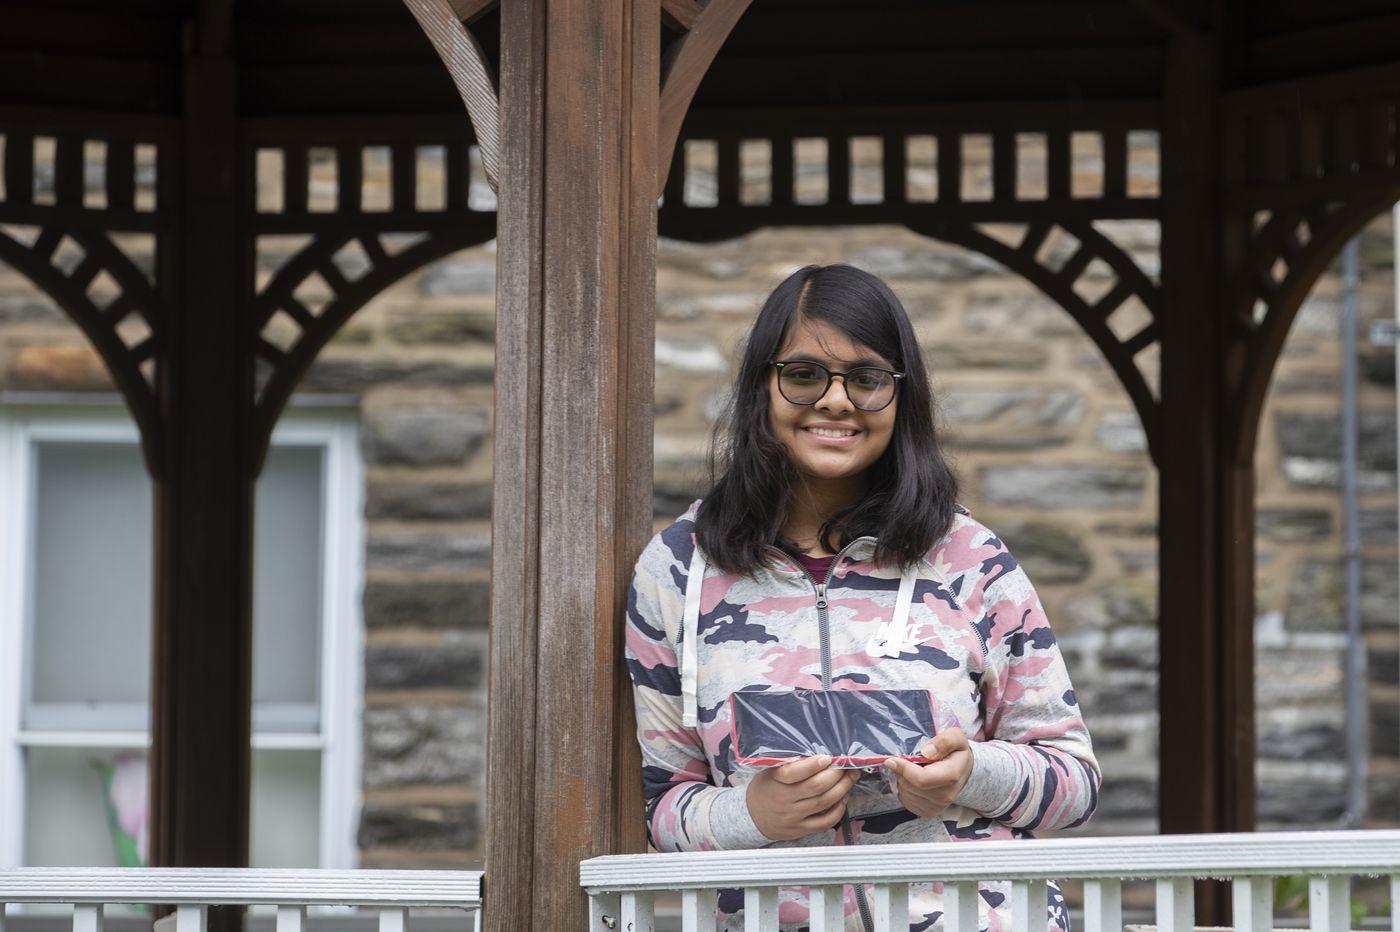 Paoli teen brightens days of nursing-home residents